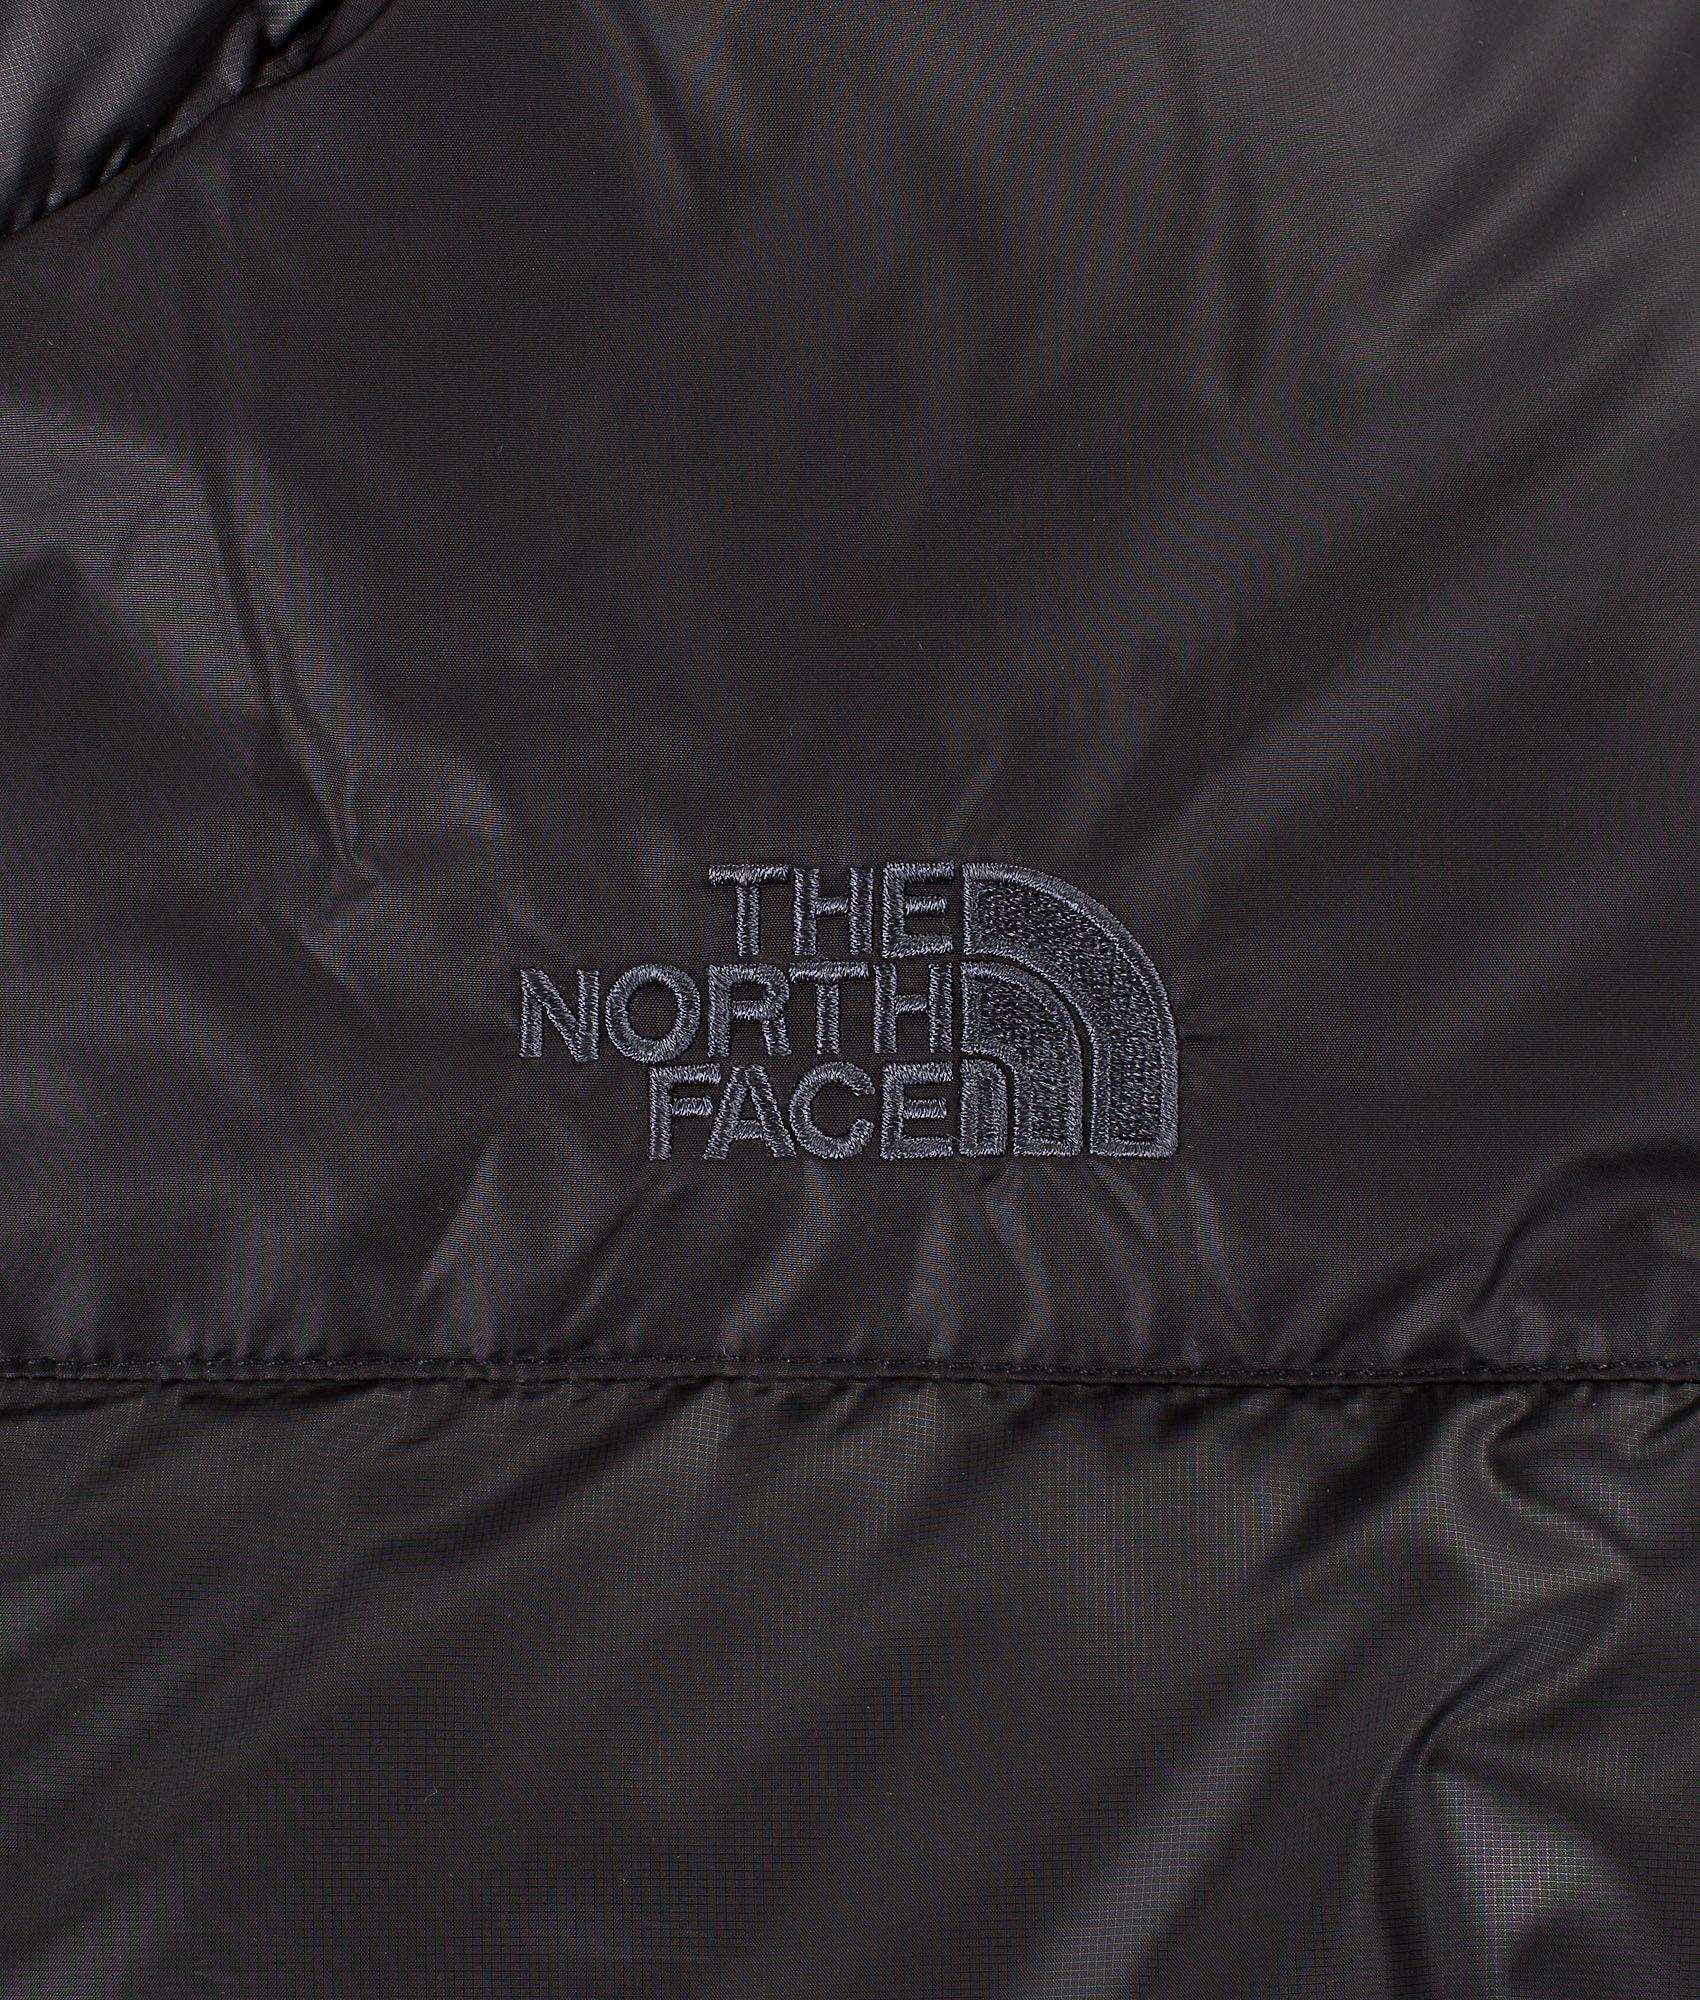 c0eec5887c35 The North Face Nuptse III Jacket Tnf Black - Ridestore.com